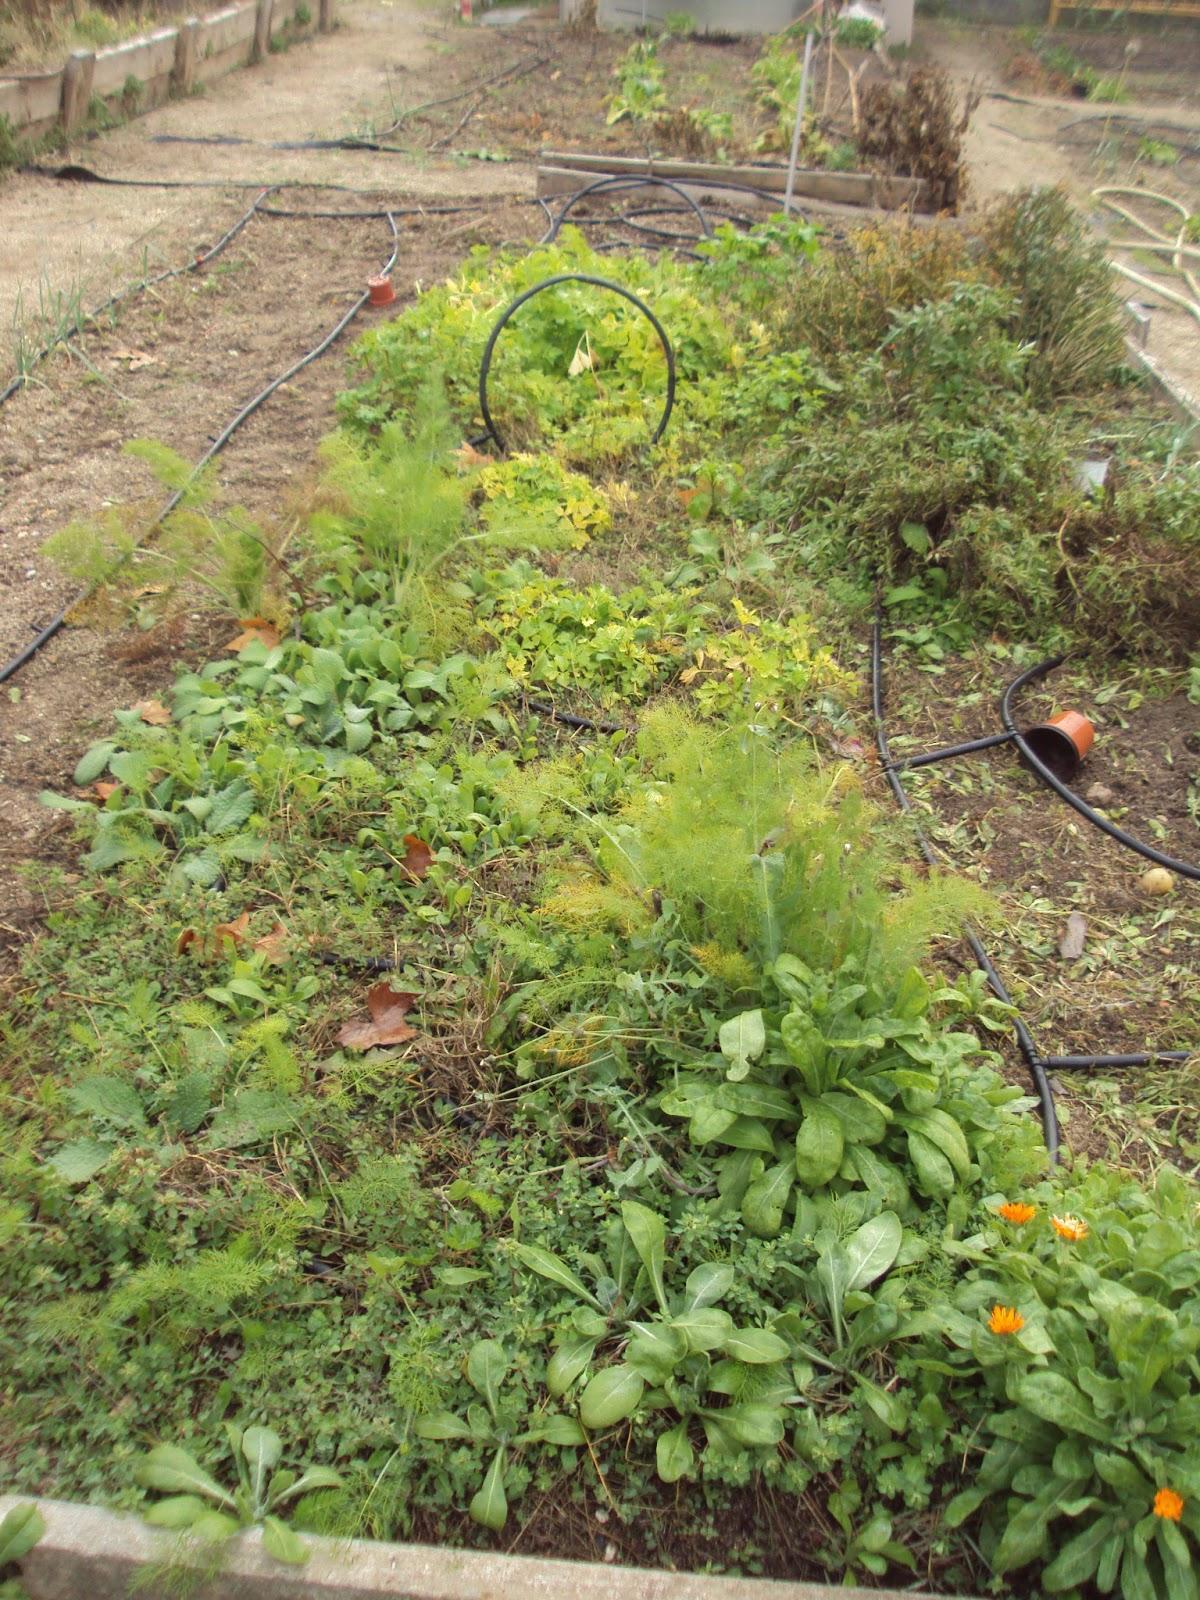 Plantas del huerto paperblog - Huerto de plantas aromaticas ...